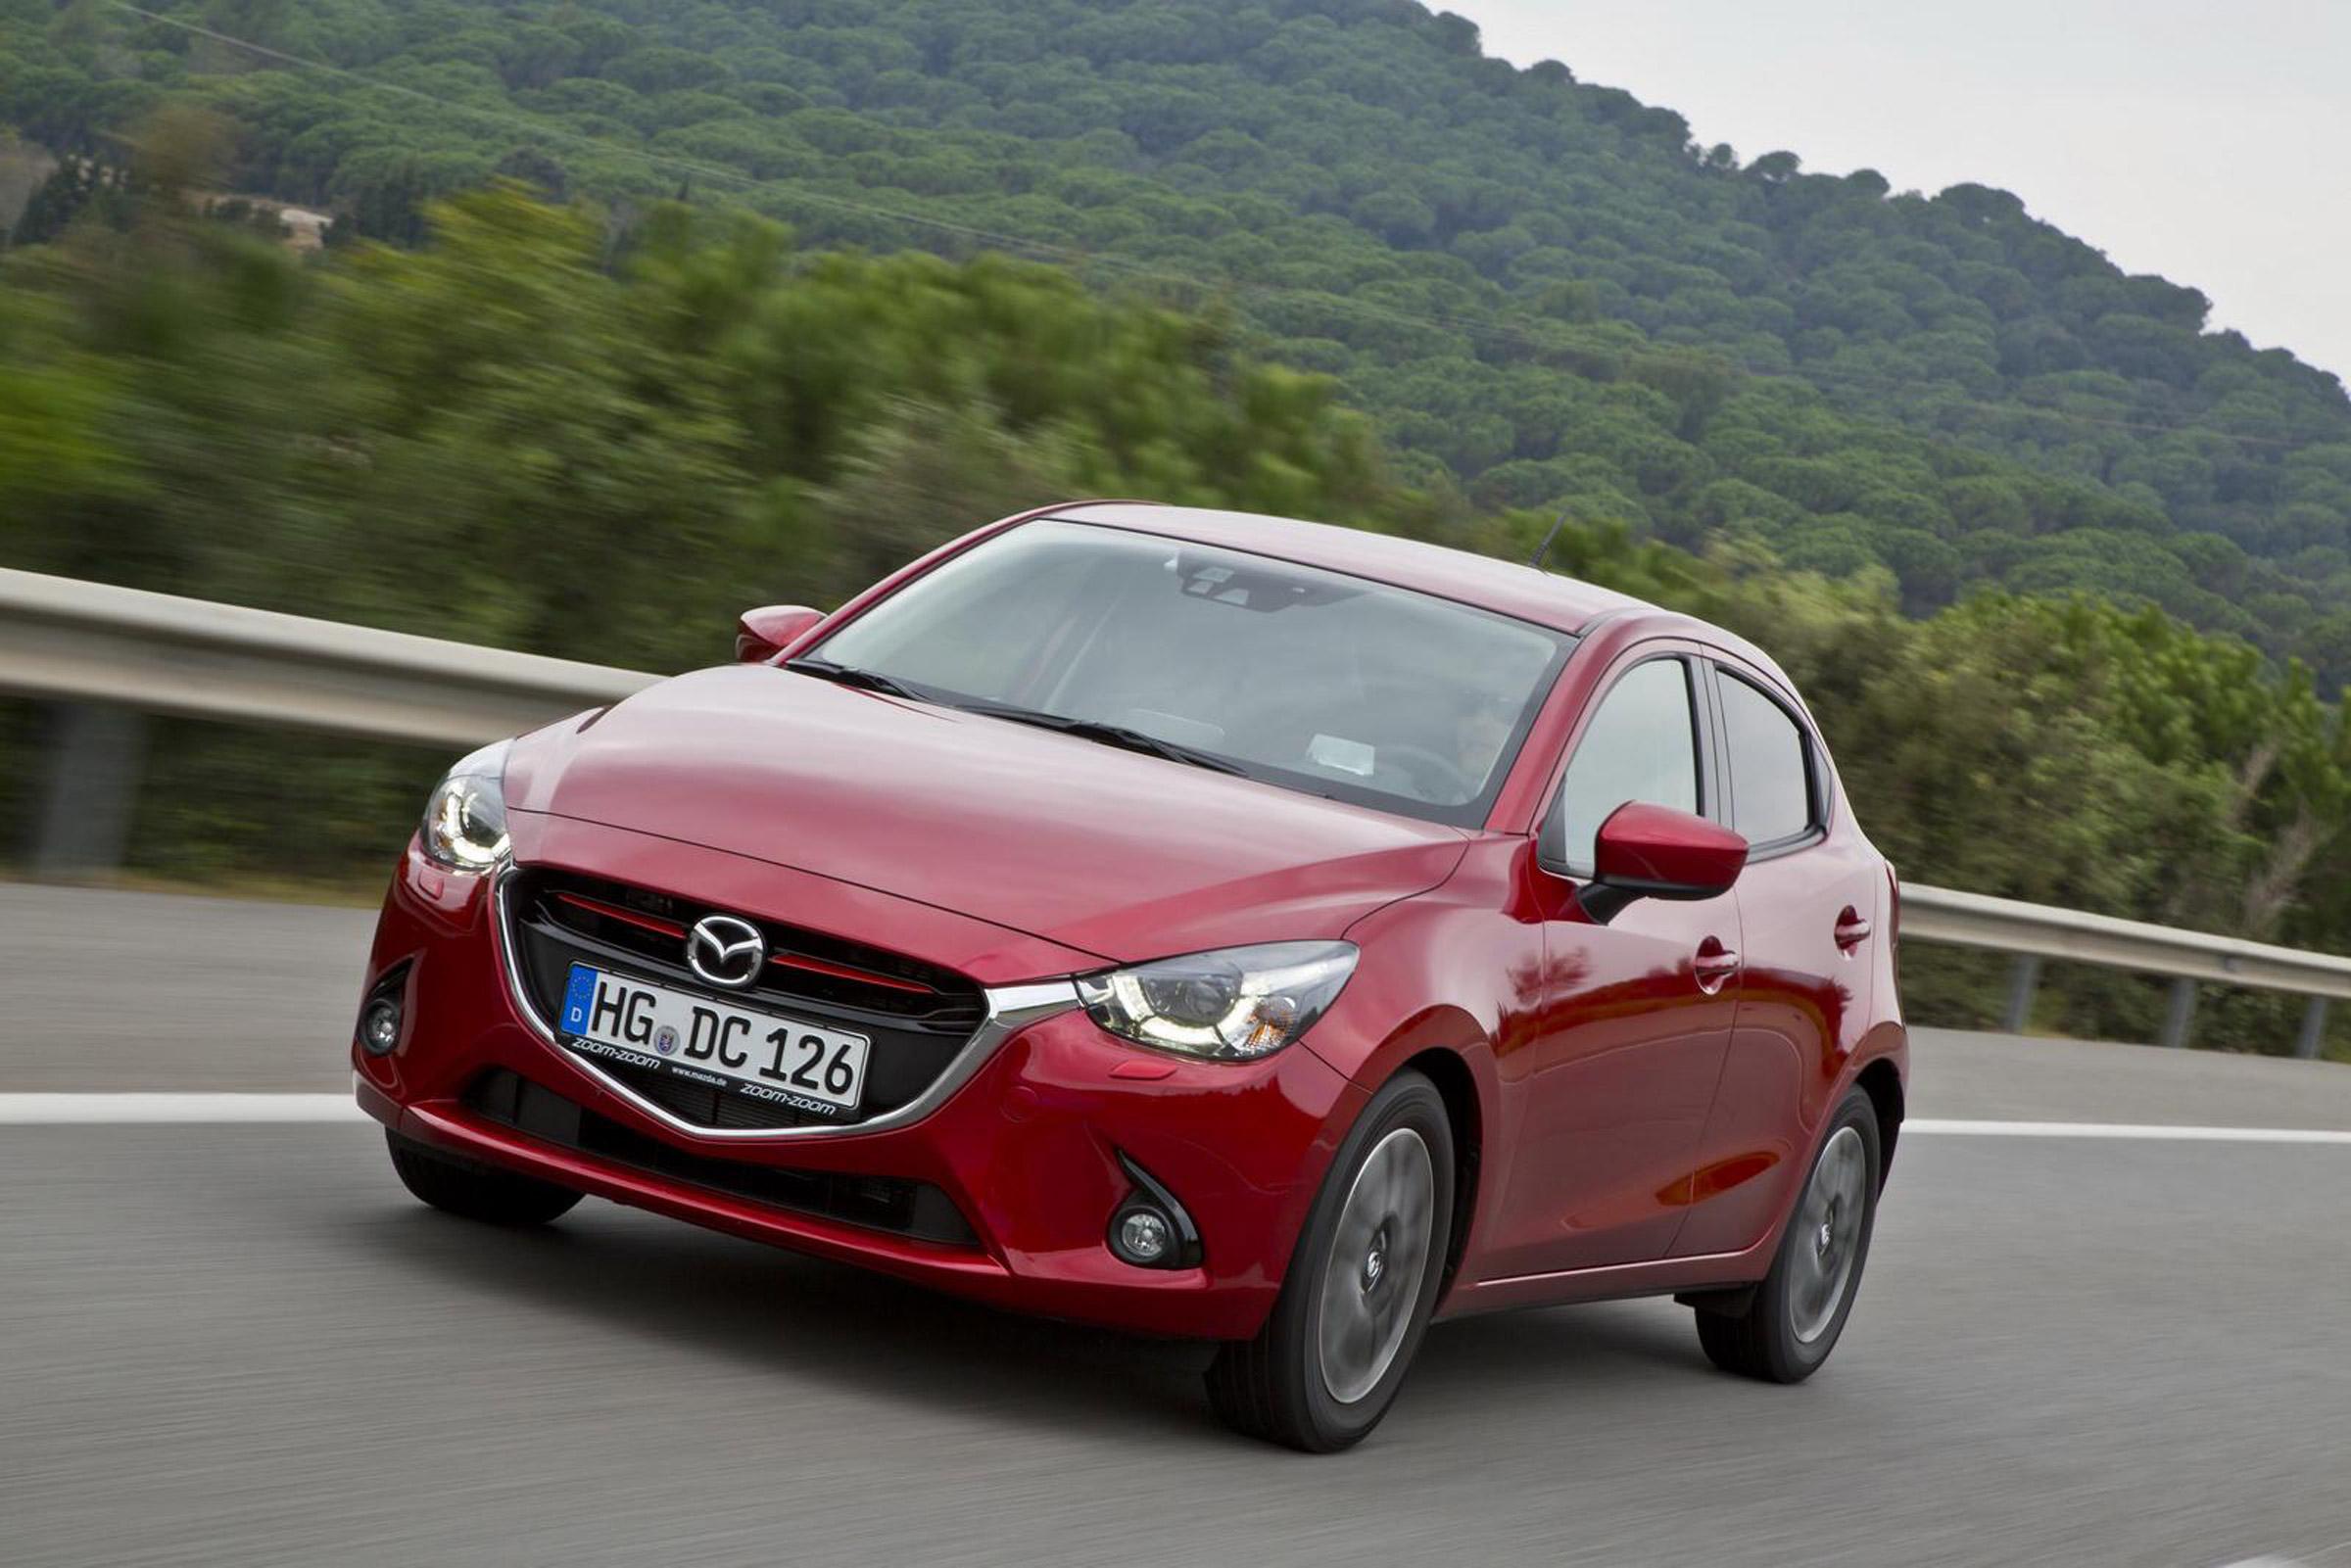 Kelebihan Mazda 2 2015 Spesifikasi